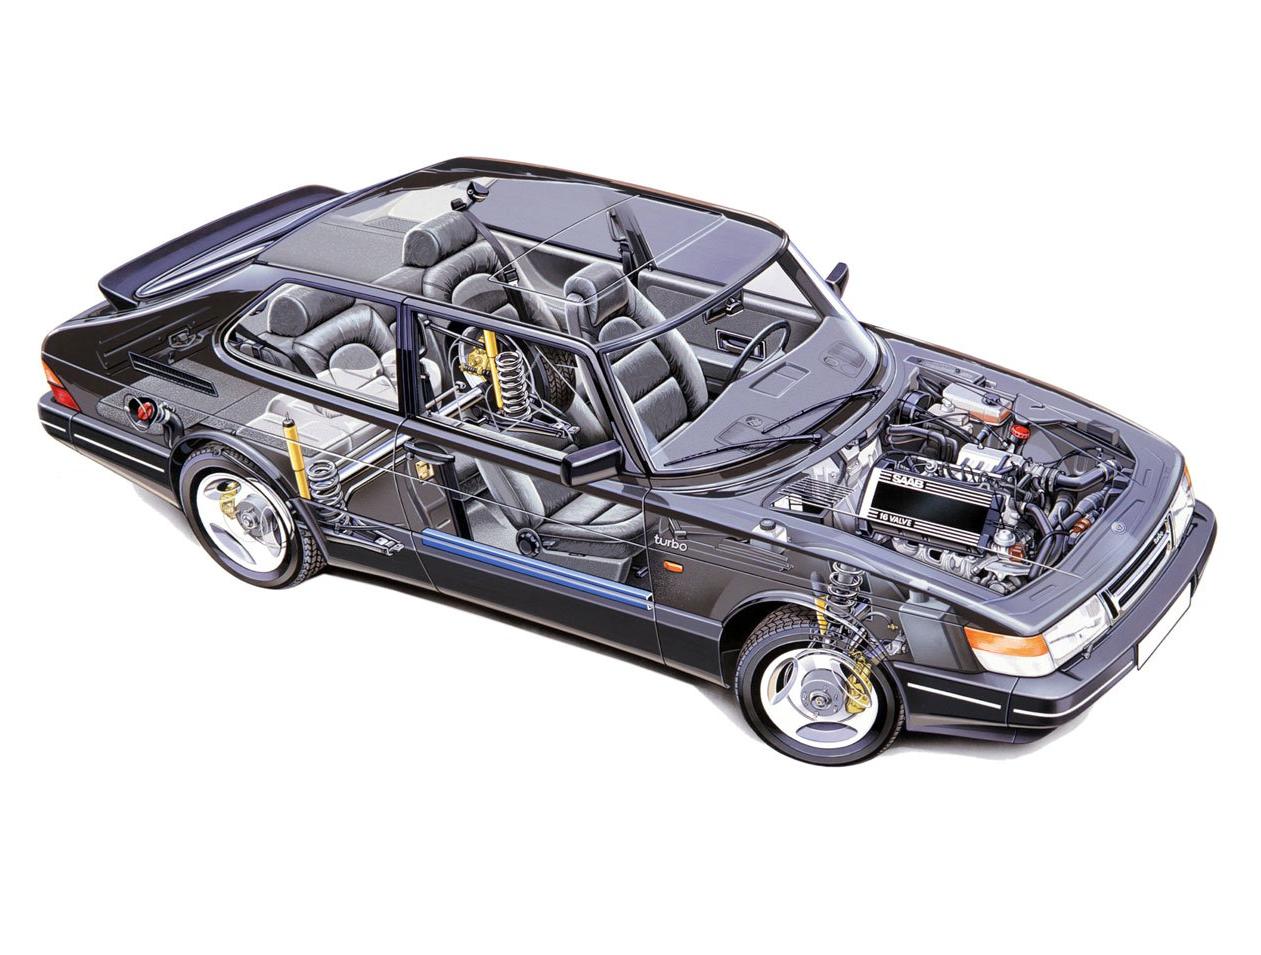 1989 saab 900 engine diagram complete wiring diagrams u2022 rh oldorchardfarm co